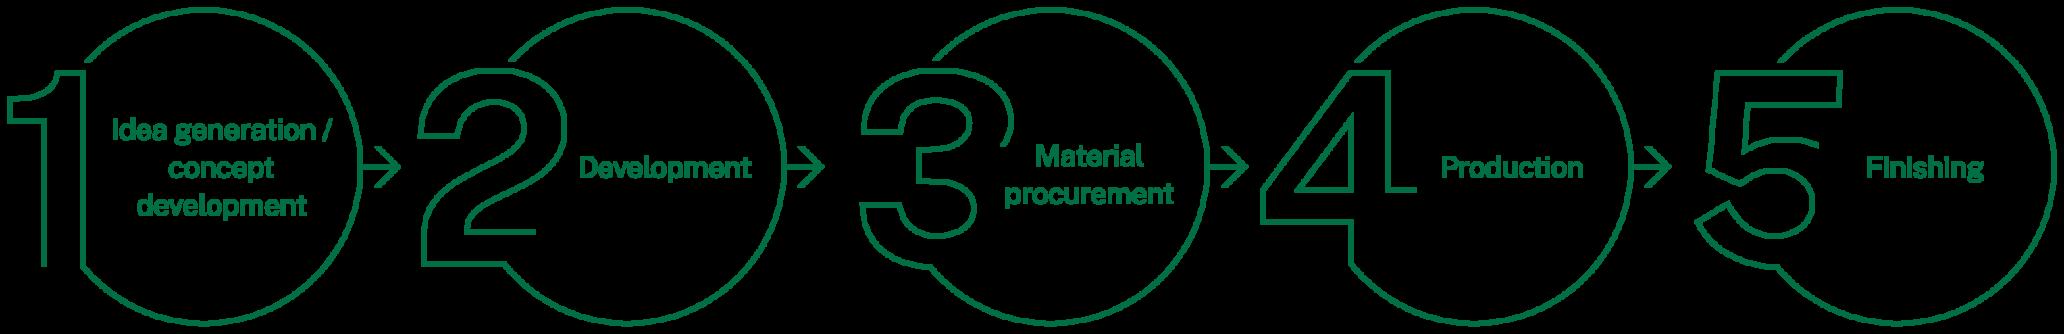 SNS Process Contract Manufacturer